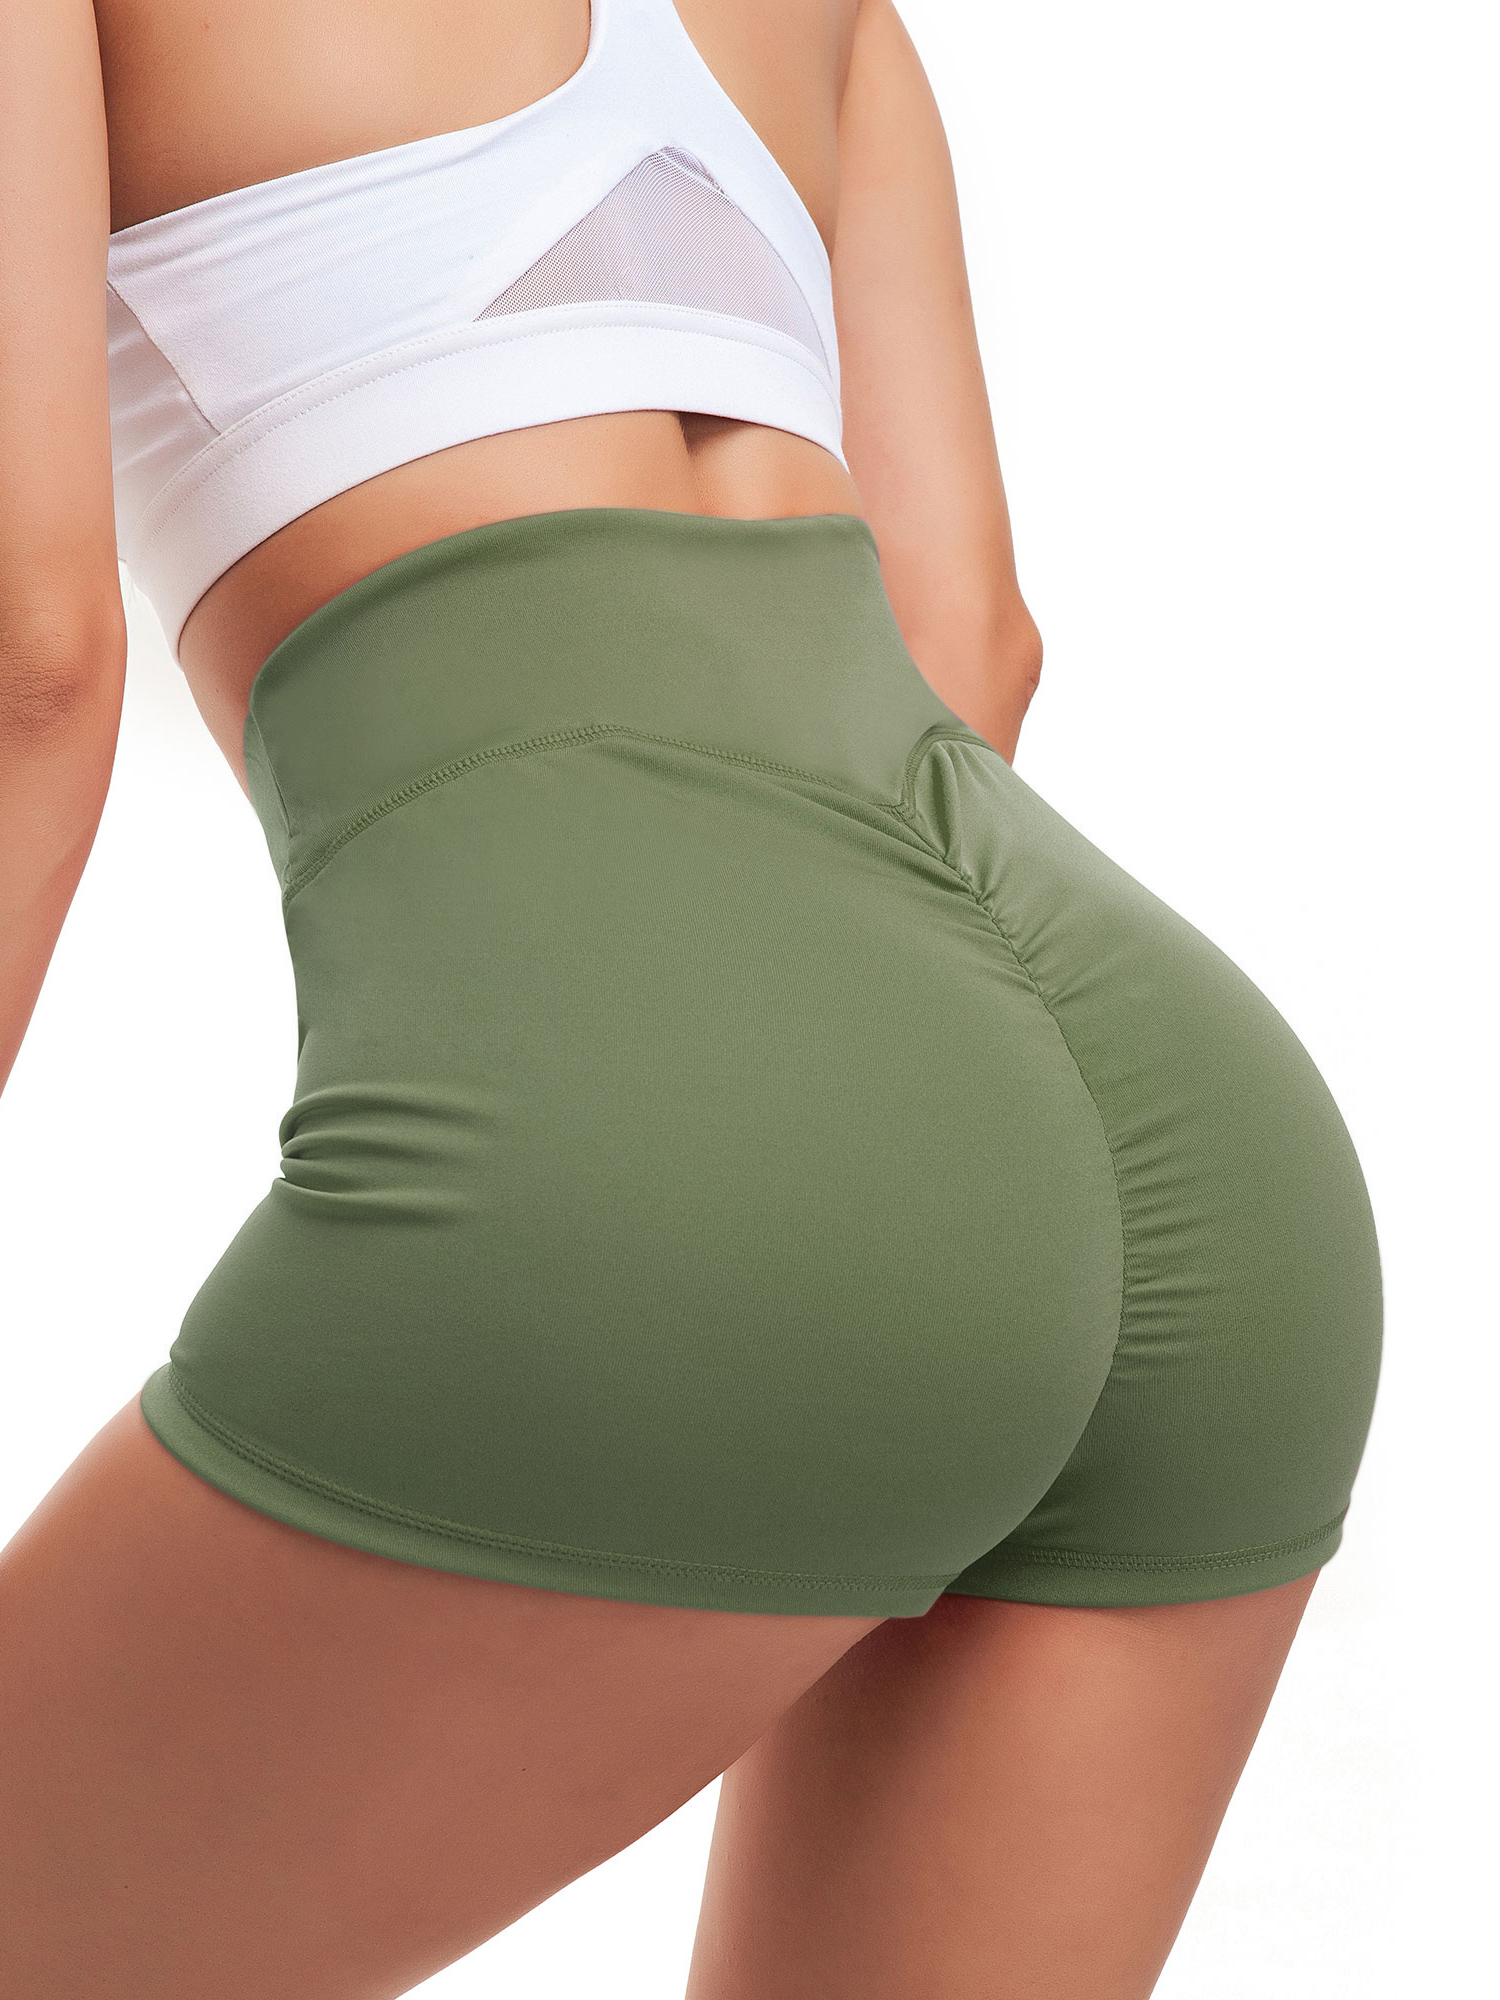 Yoga Shorts ~ Organic Cotton Shorts ~ Booty Shorts ~ Yoga Shorts